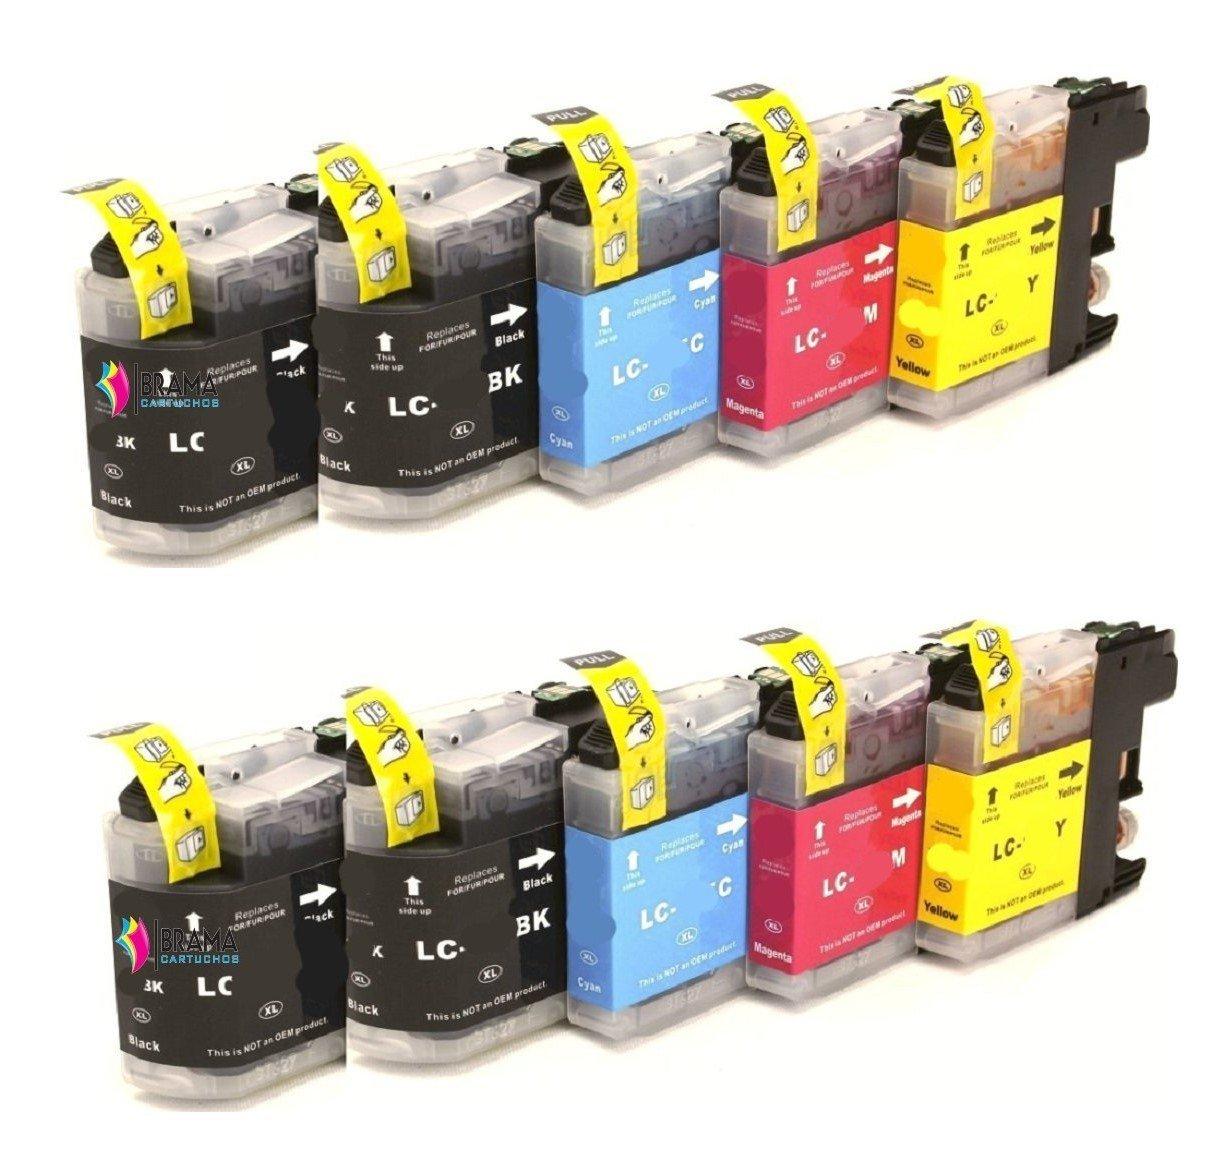 10 x Cartuchos Compatibles para Brother Lc121 Lc123 XL ALTA ...